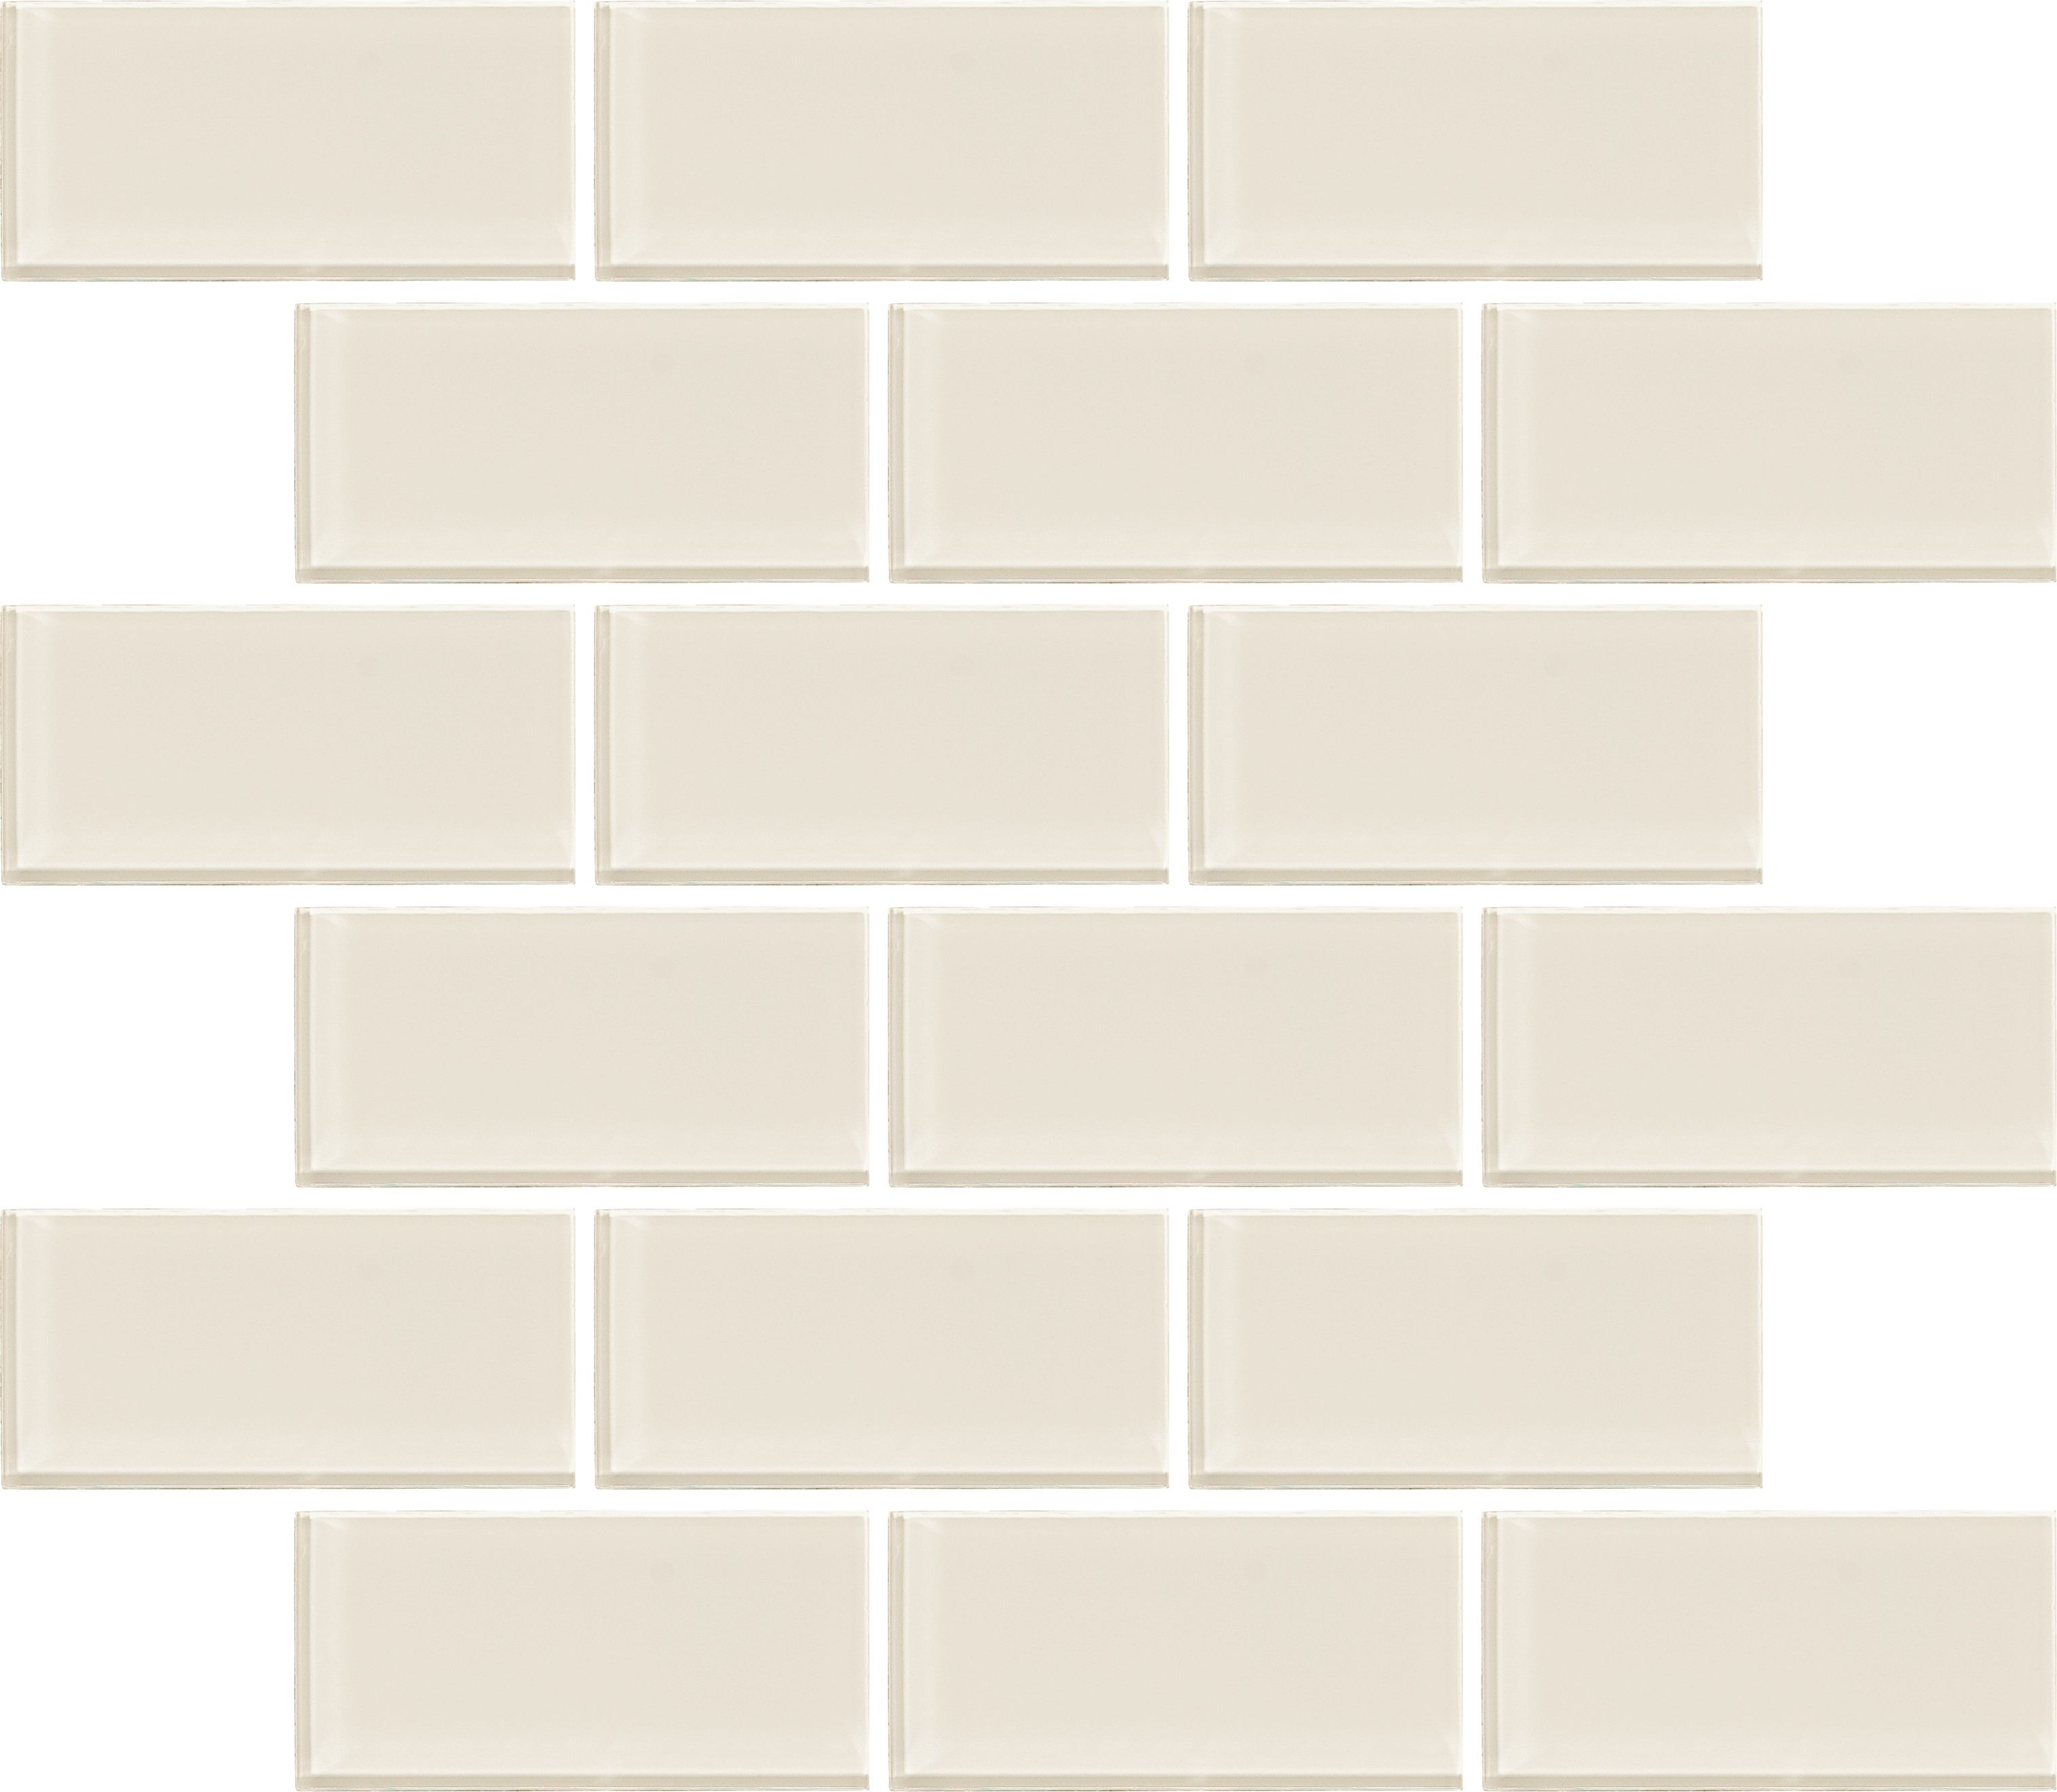 Utc0224 Ivory 2 X4 Mosaic Glass Glass Brick Tile Floor